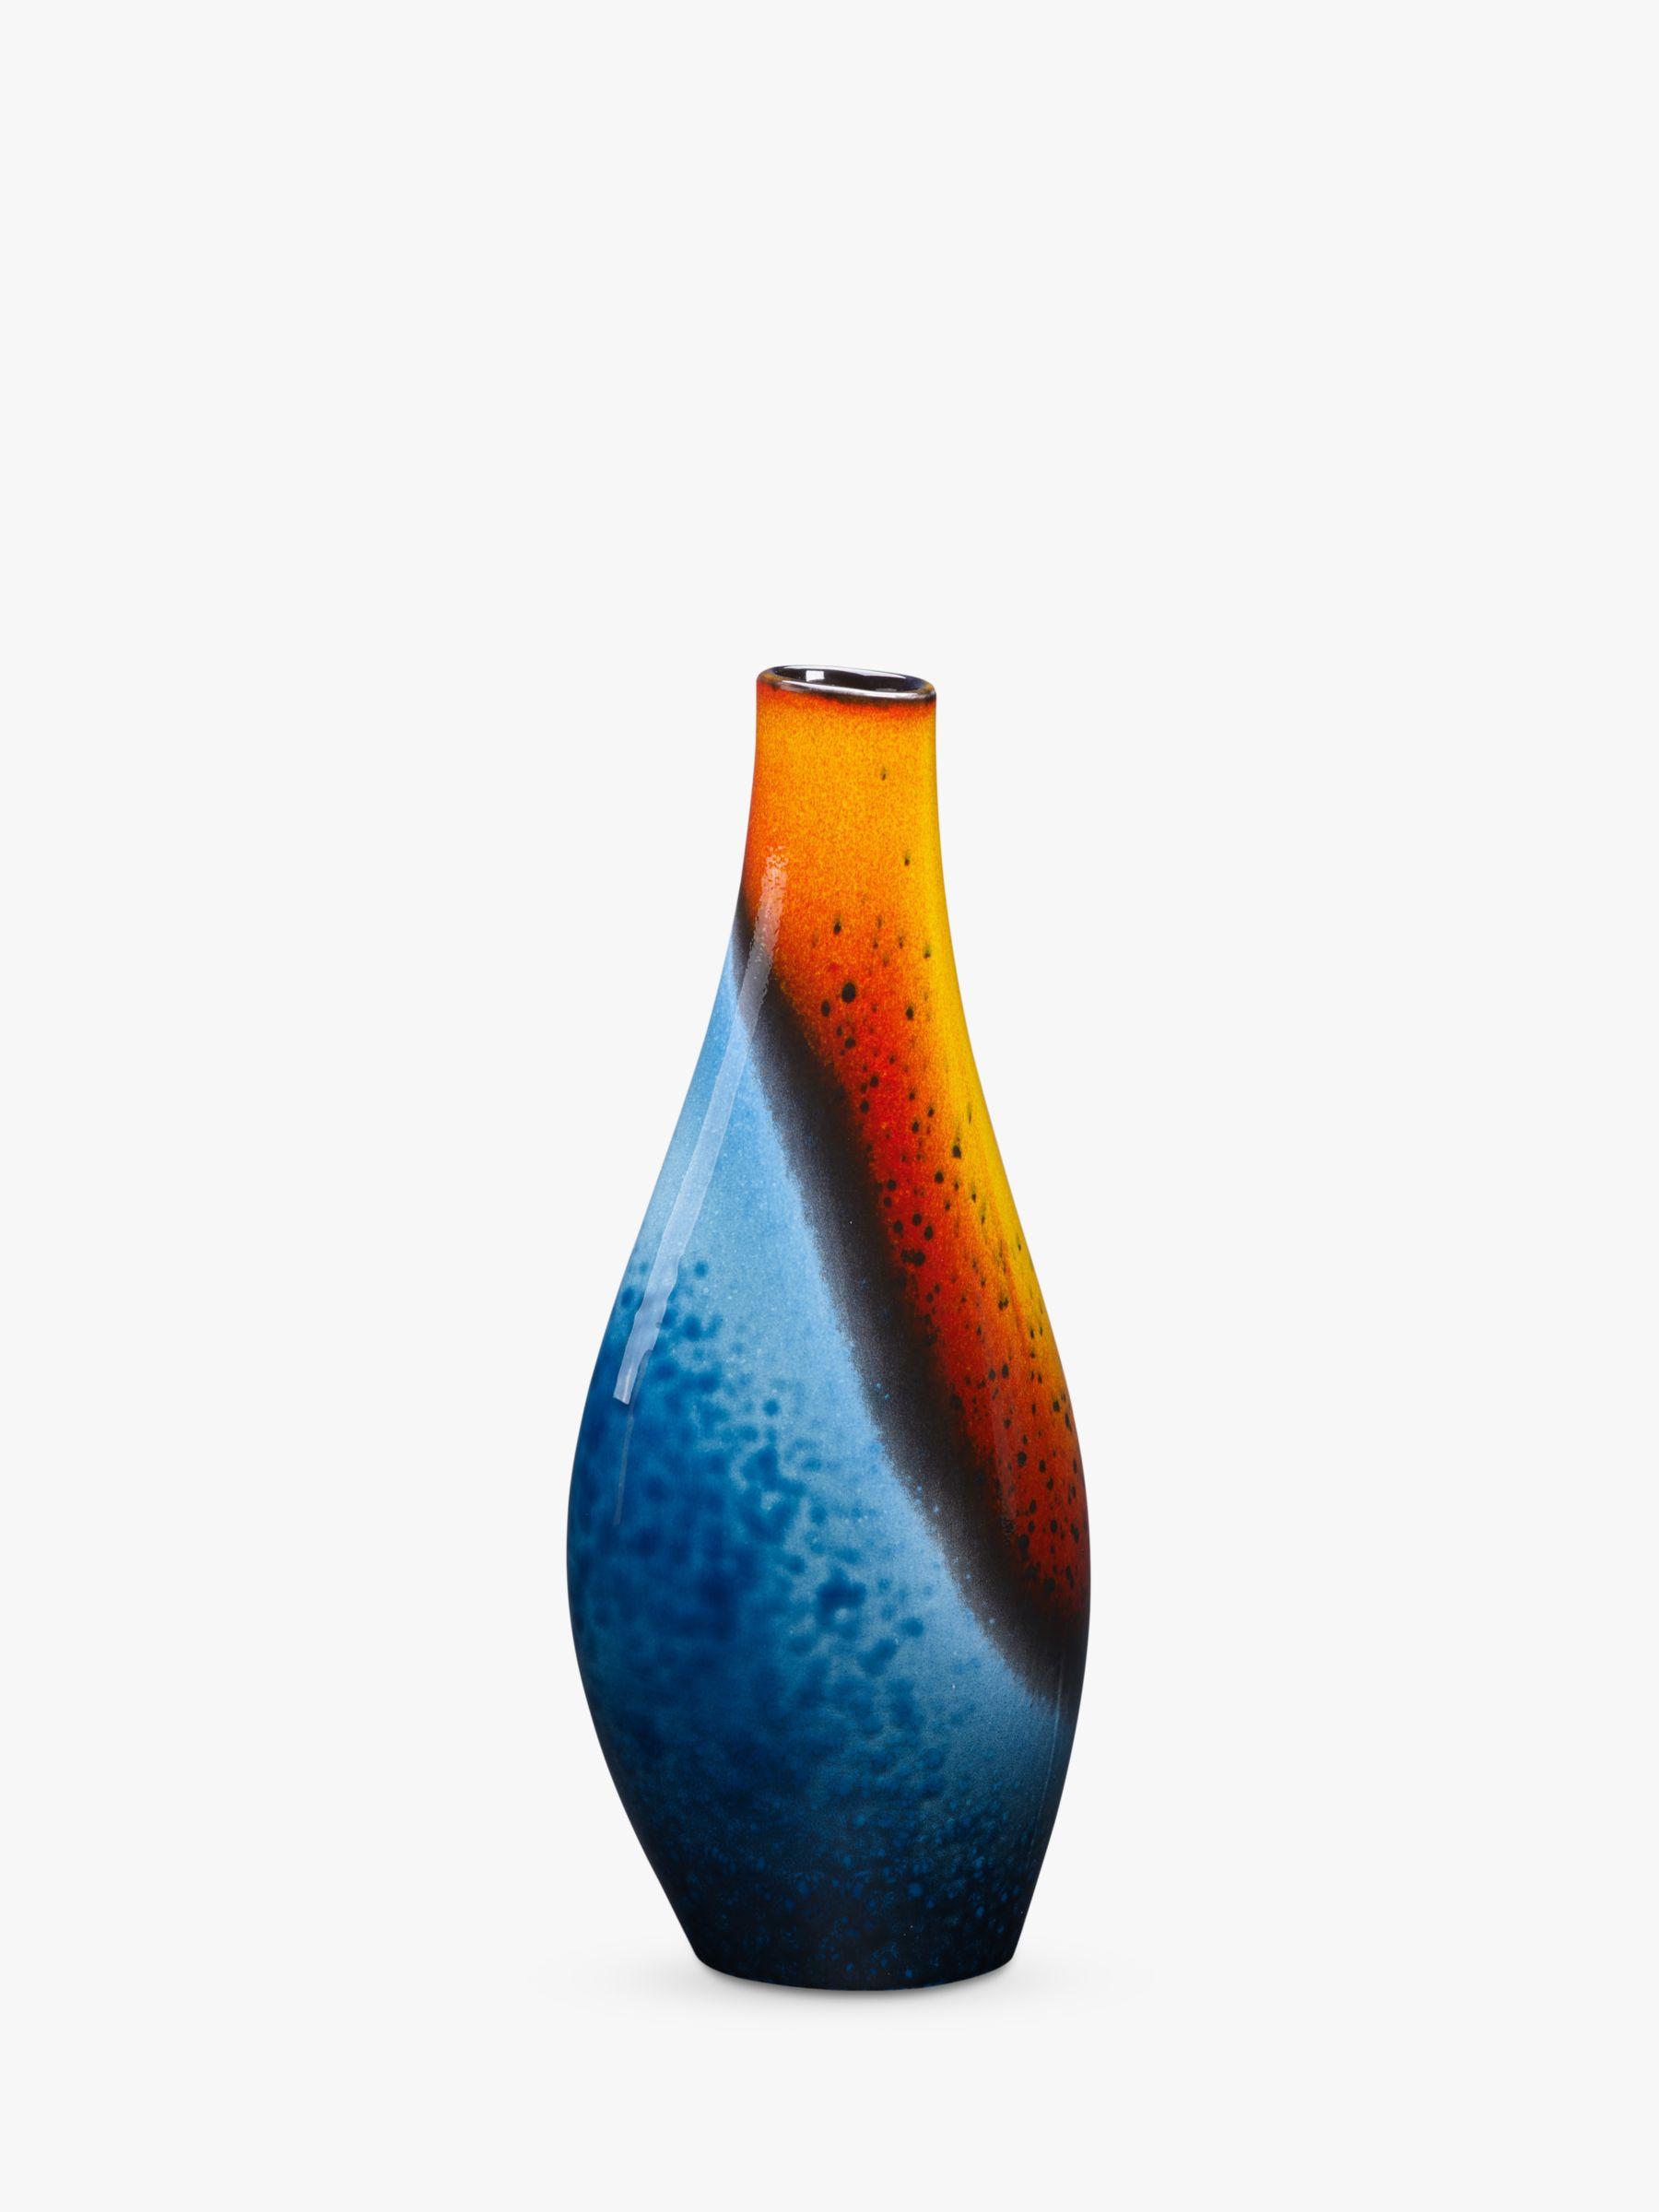 Poole Pottery Poole Pottery Flare Asymmetrical Twist Vase, H34cm